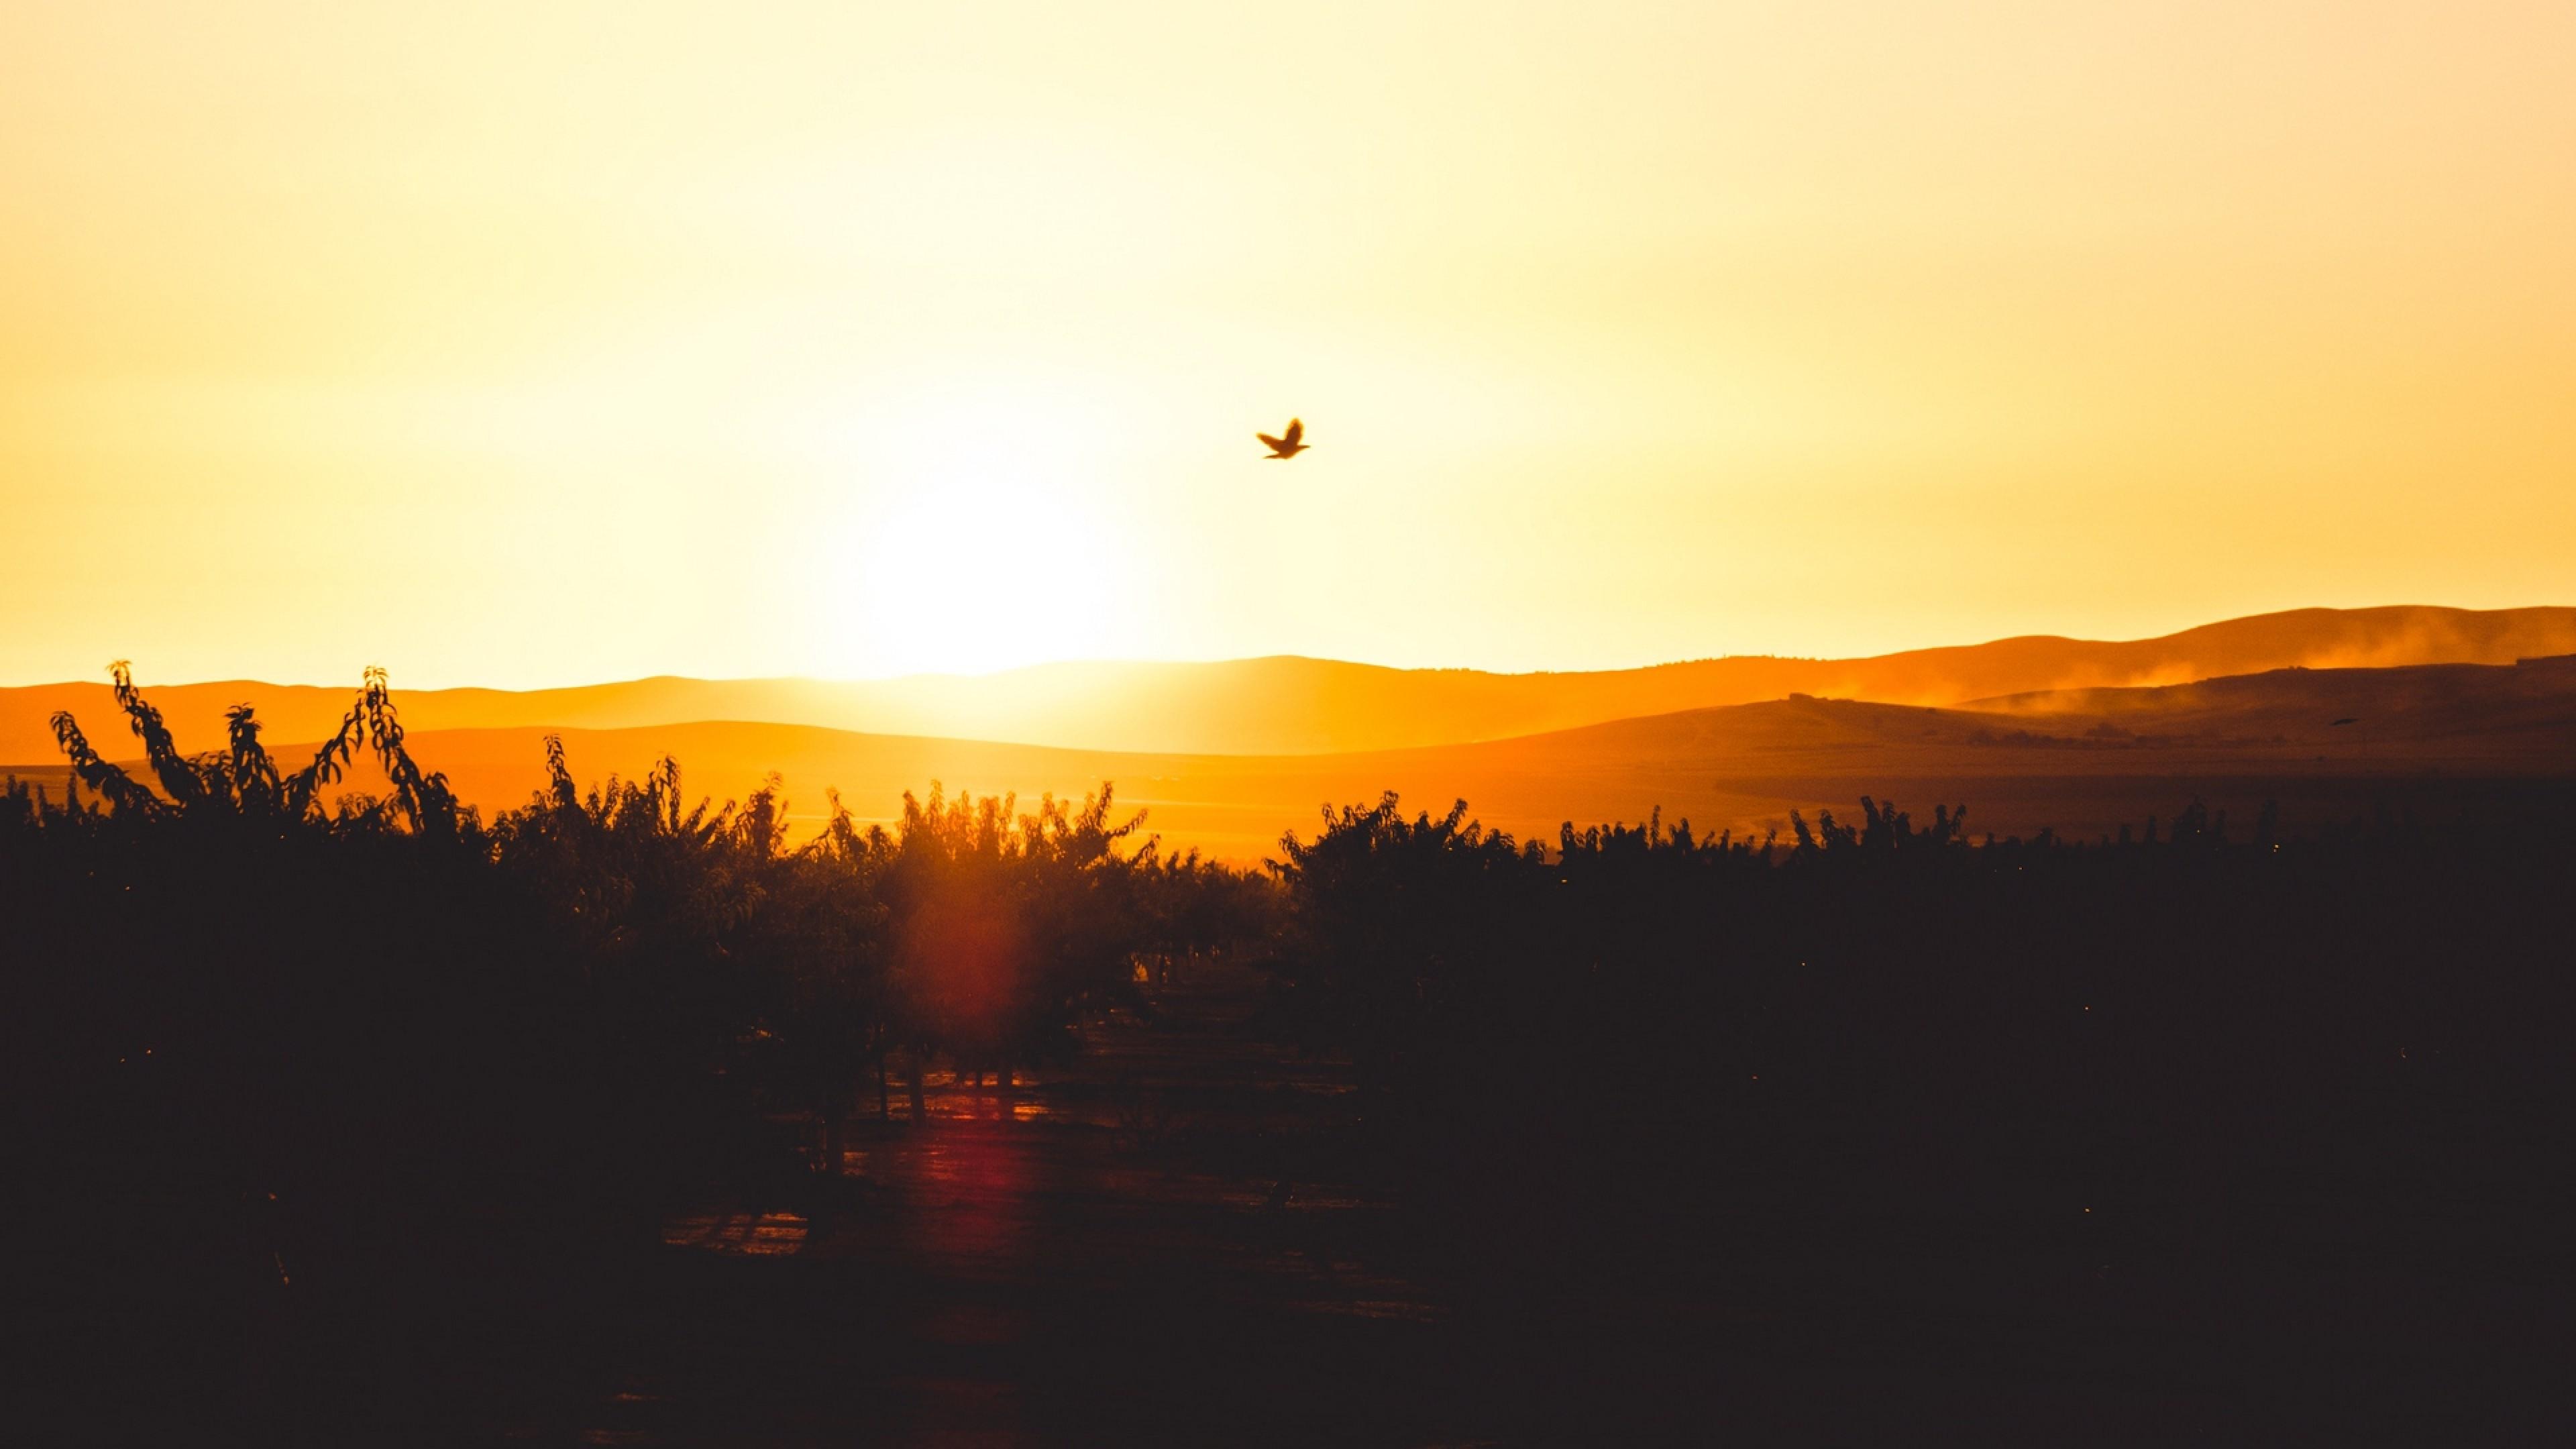 Bird Flying During The Sunset Hd Wallpaper 4k Ultra Hd Hd